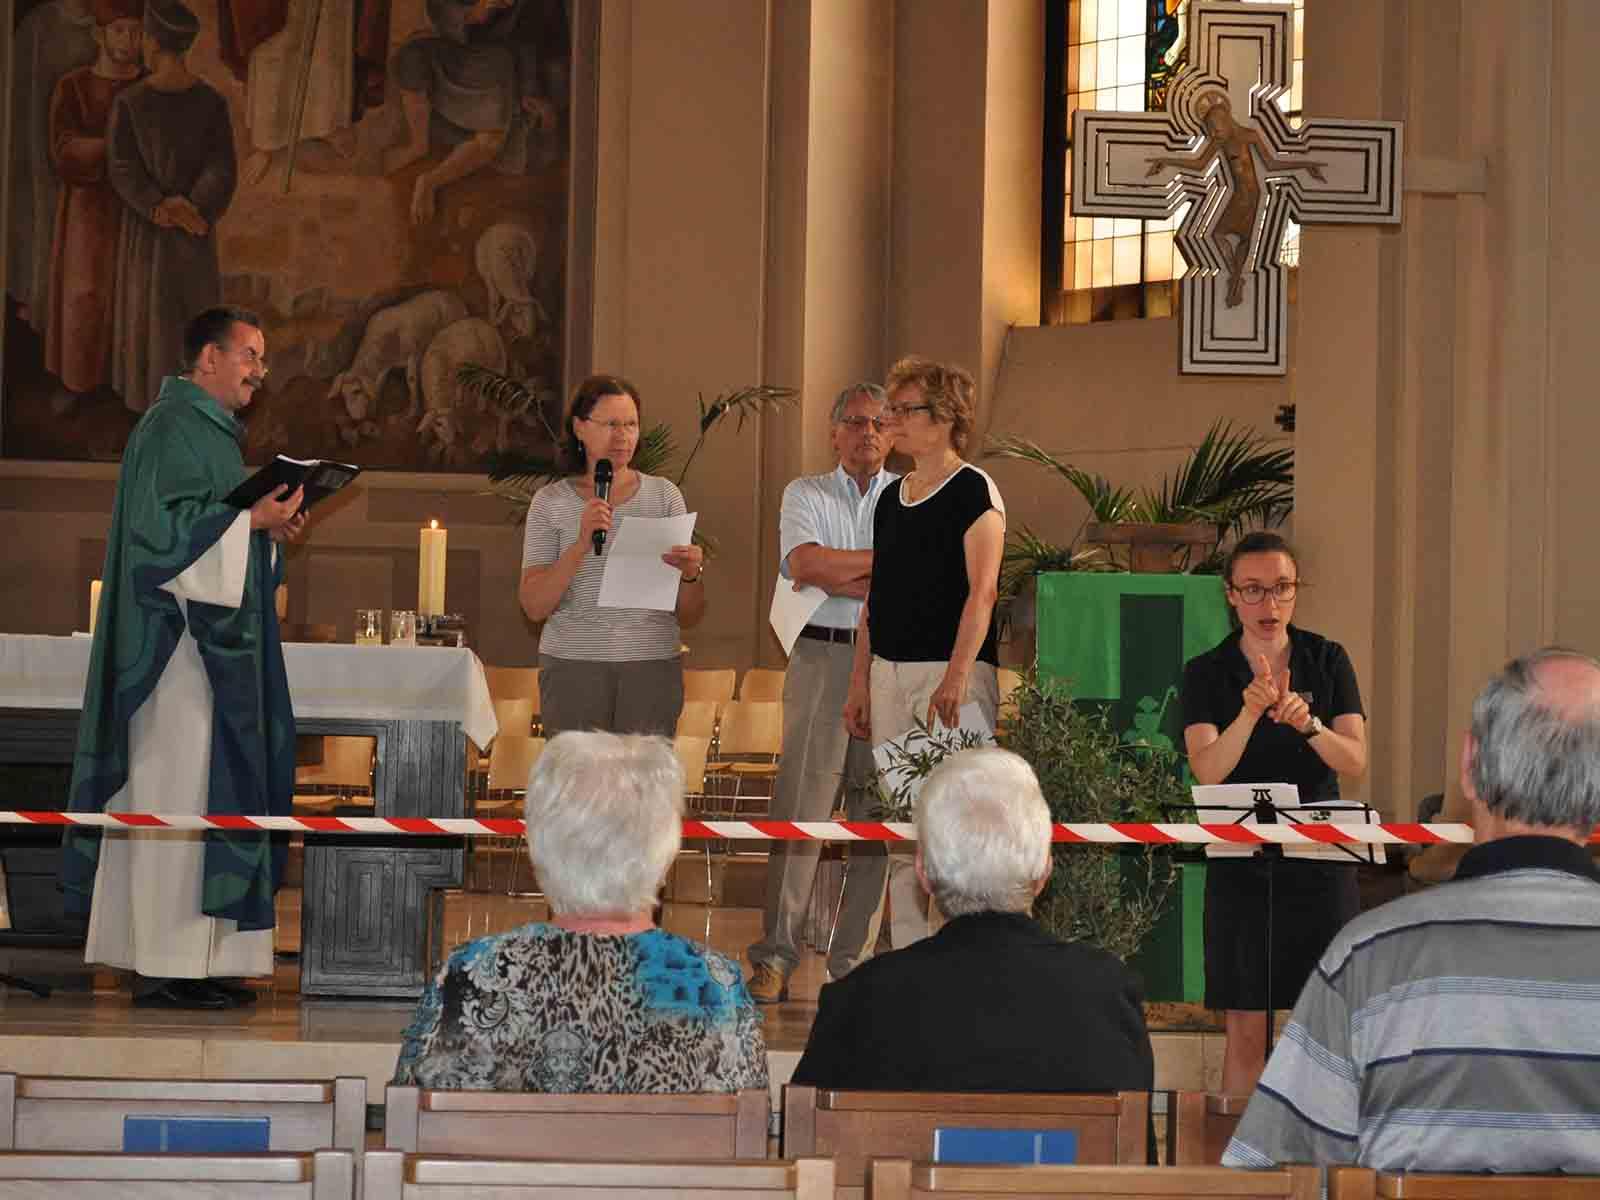 Von links nach rechts: Pfarrer Beat Häfliger, Regula Eberle (Behindertenseelsorge), Fredy Solenthaler, Irene Bopp.